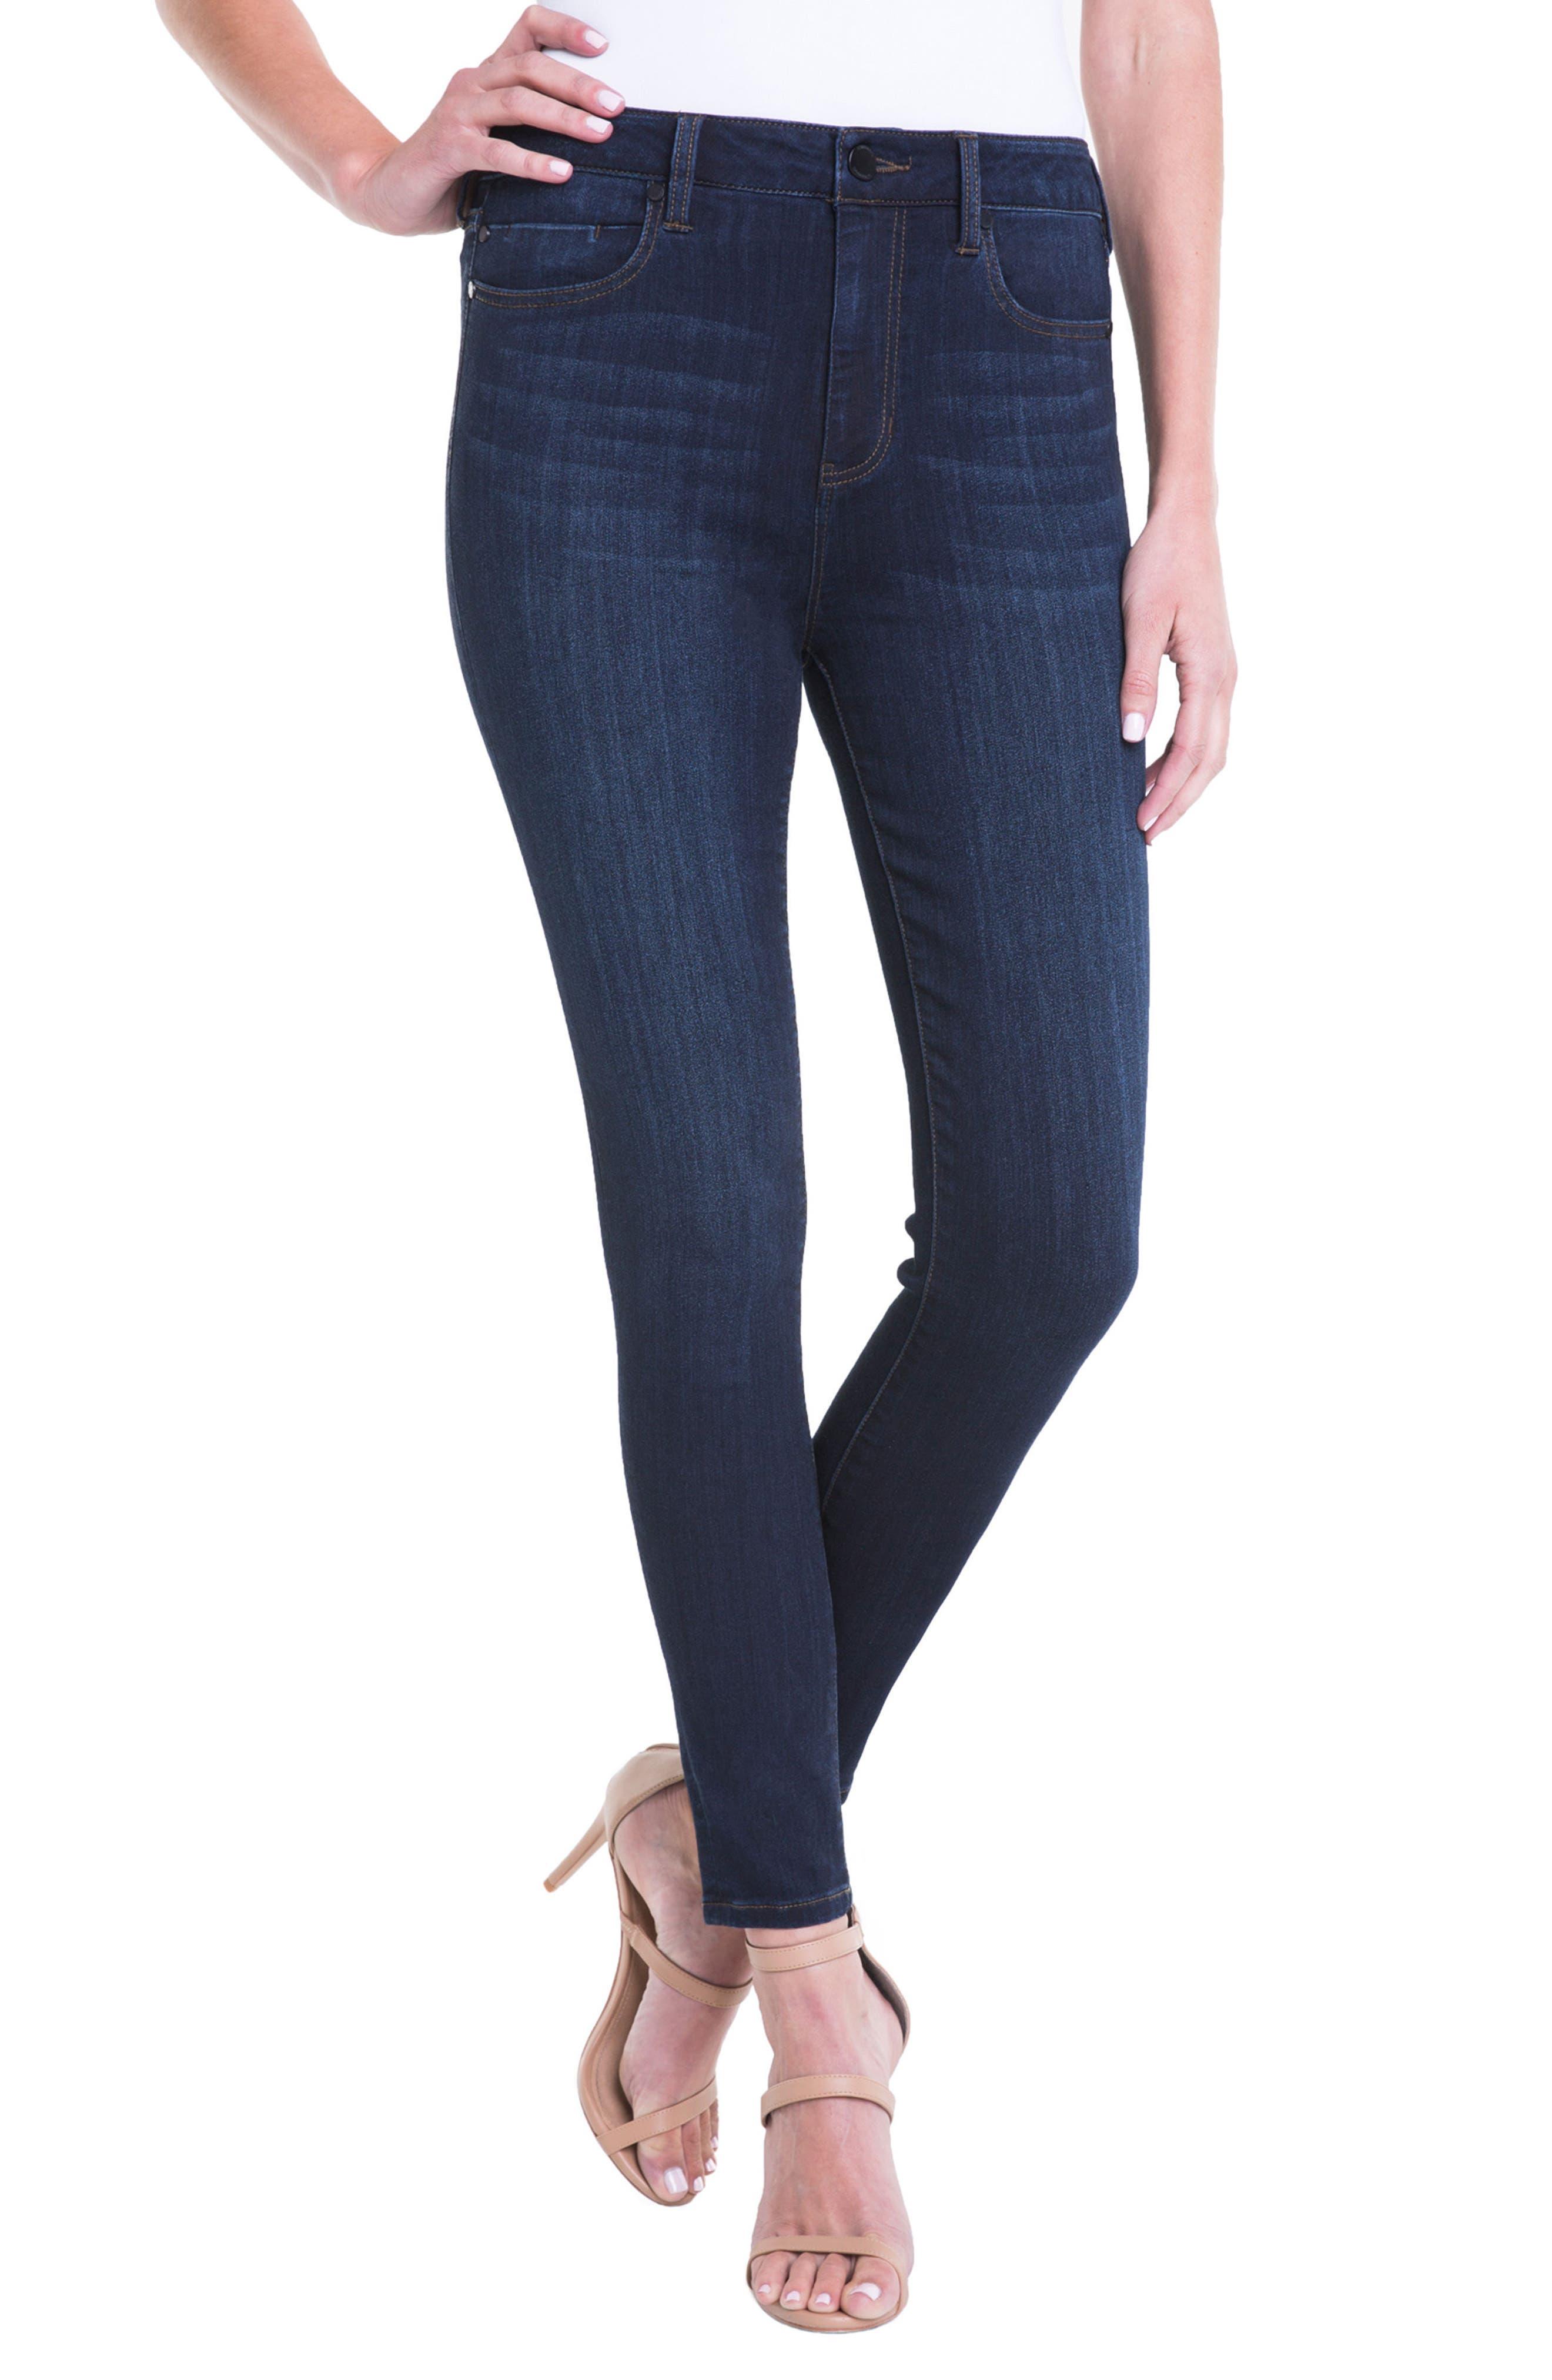 Women's Liverpool Jeans Company Bridget High Waist Skinny Jeans